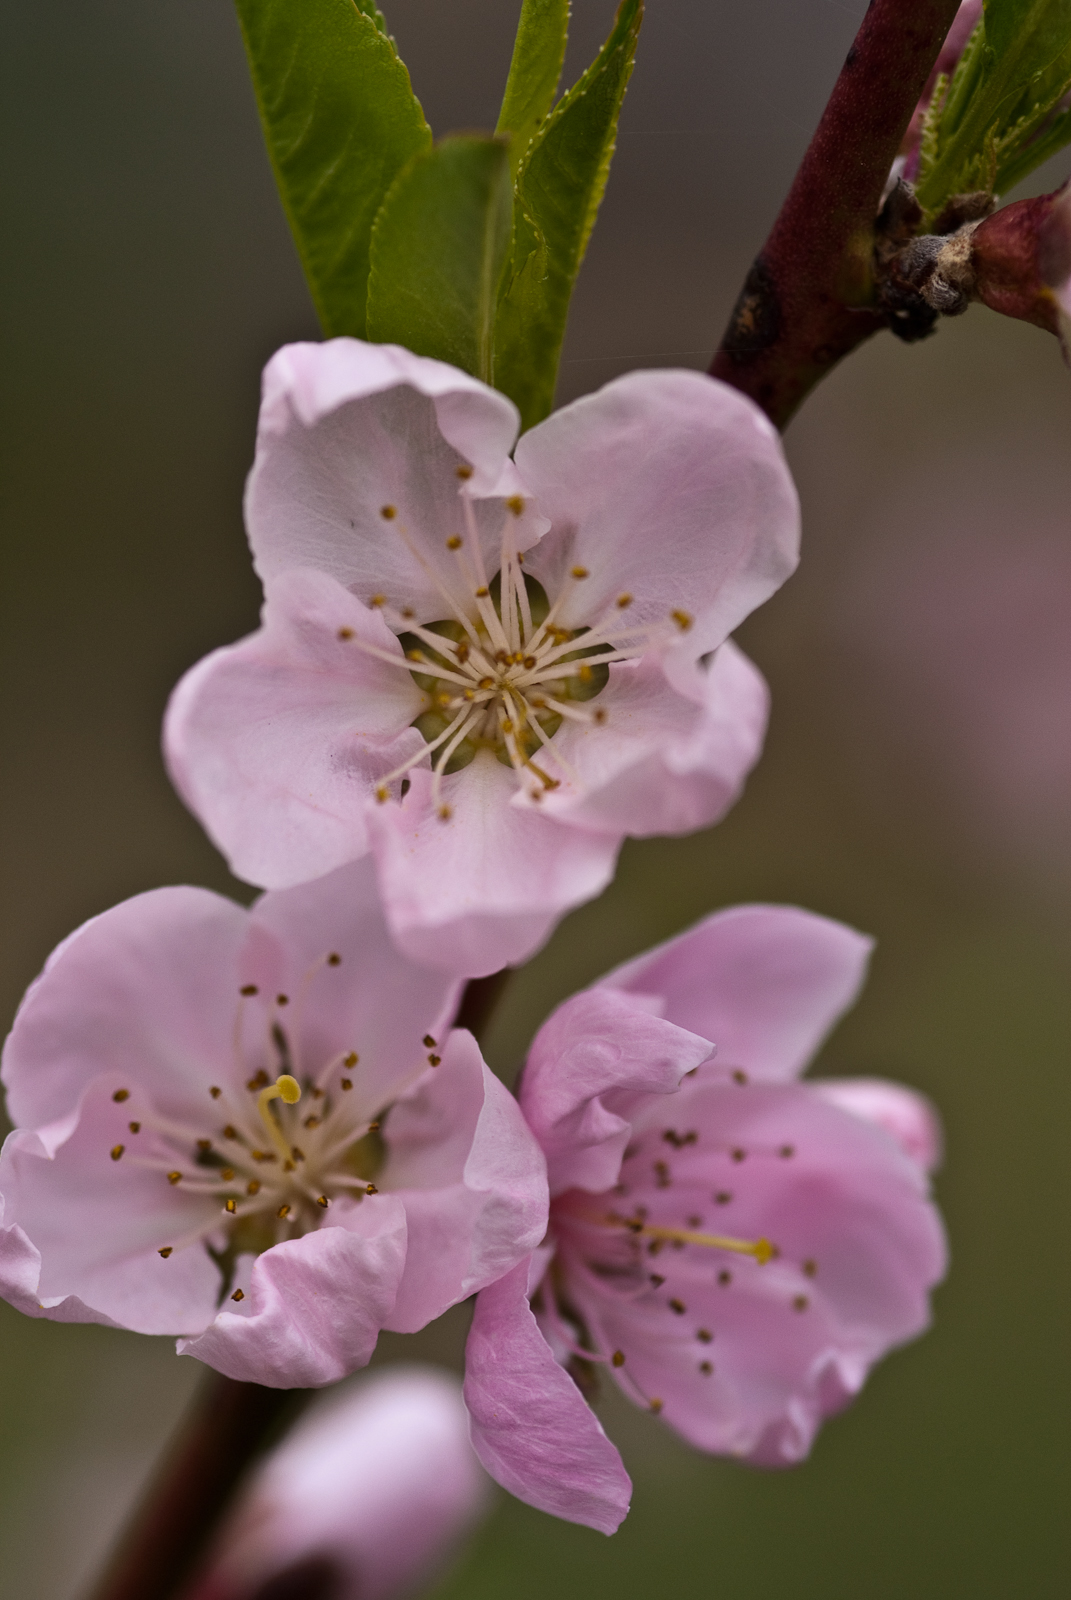 Flowers World Pink Peach Tree Blossom